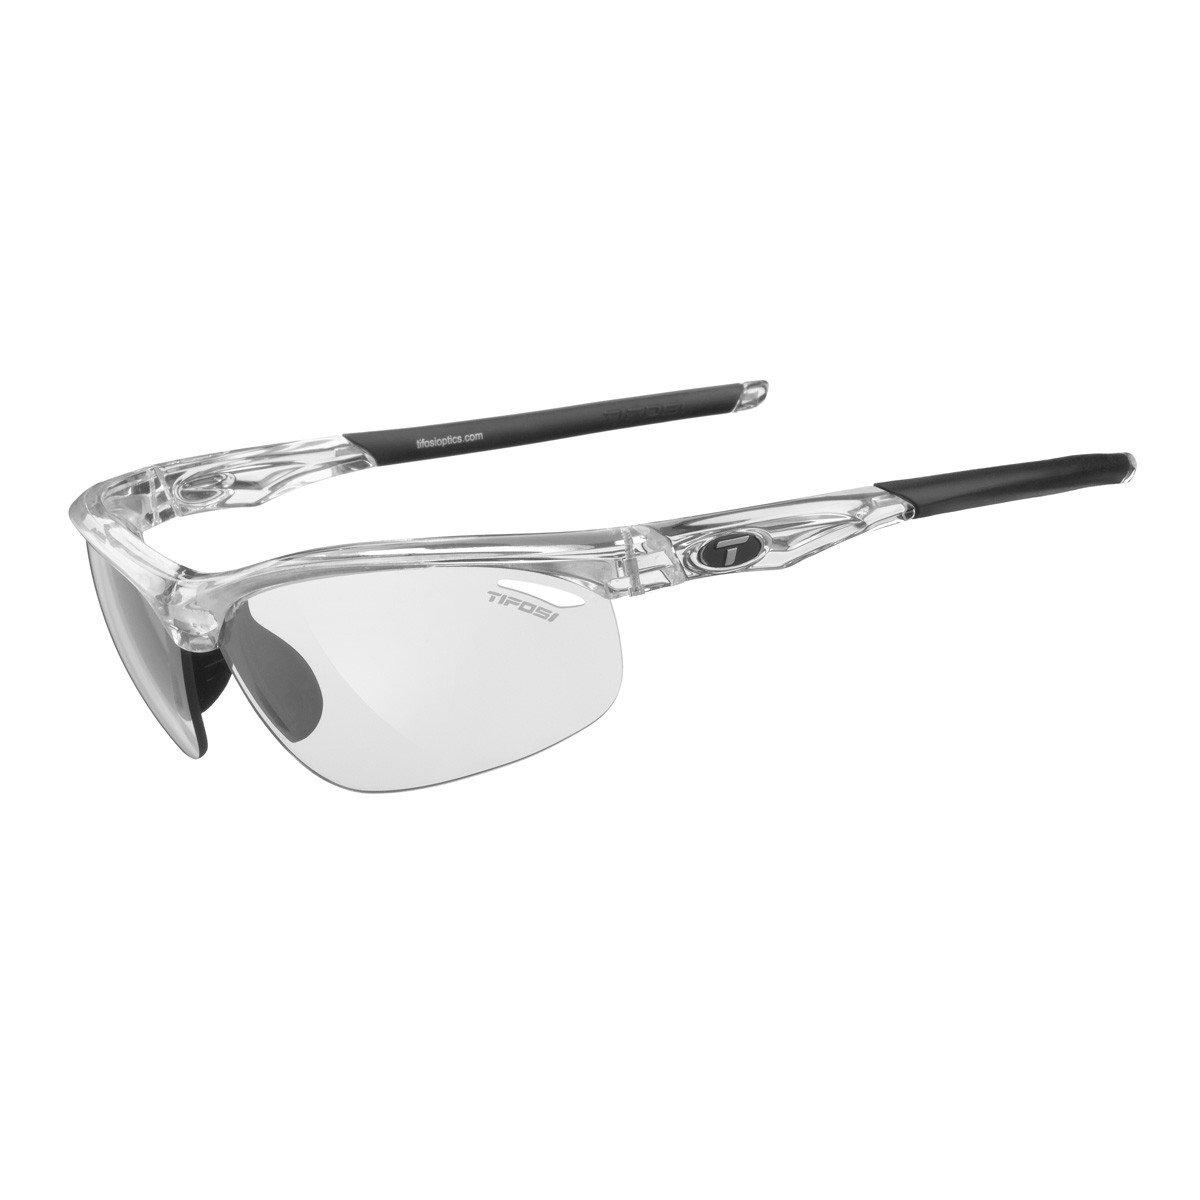 Tifosi Optics Sport Veloce, 1040305331 - Gafas de Ciclismo para Hombre, Talla única, Color Transparente